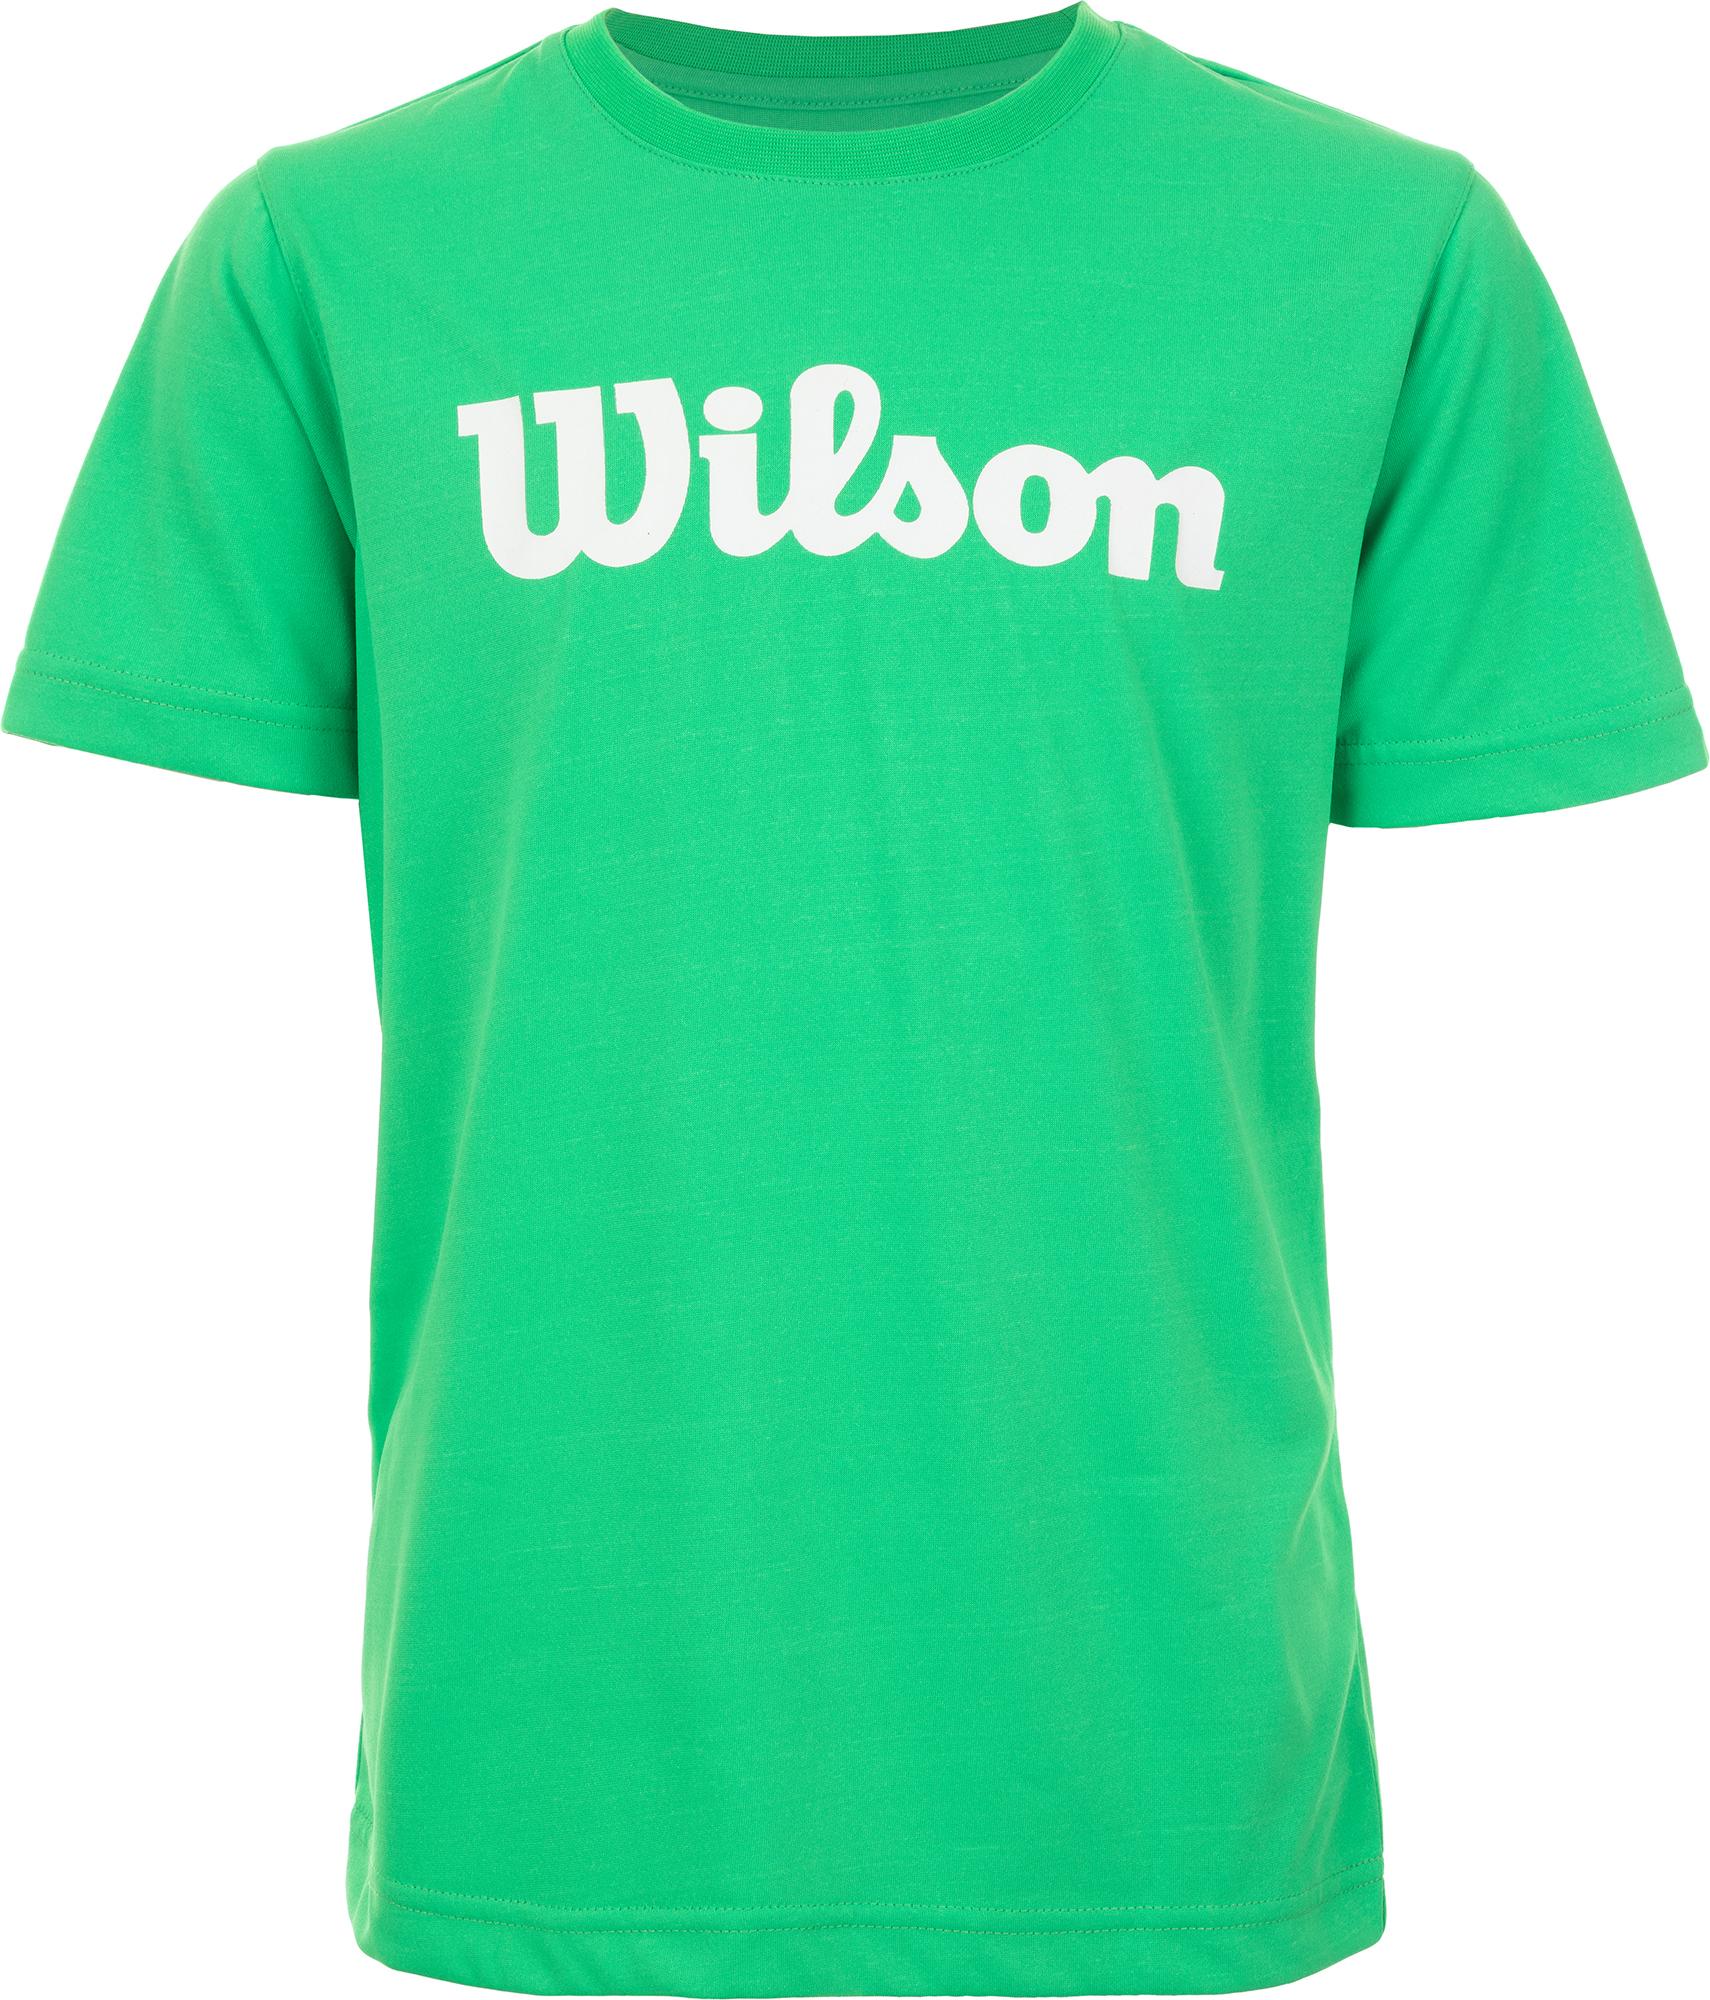 Wilson Футболка для мальчиков Wilson Team Script Tech Tee, размер 152-162 цена